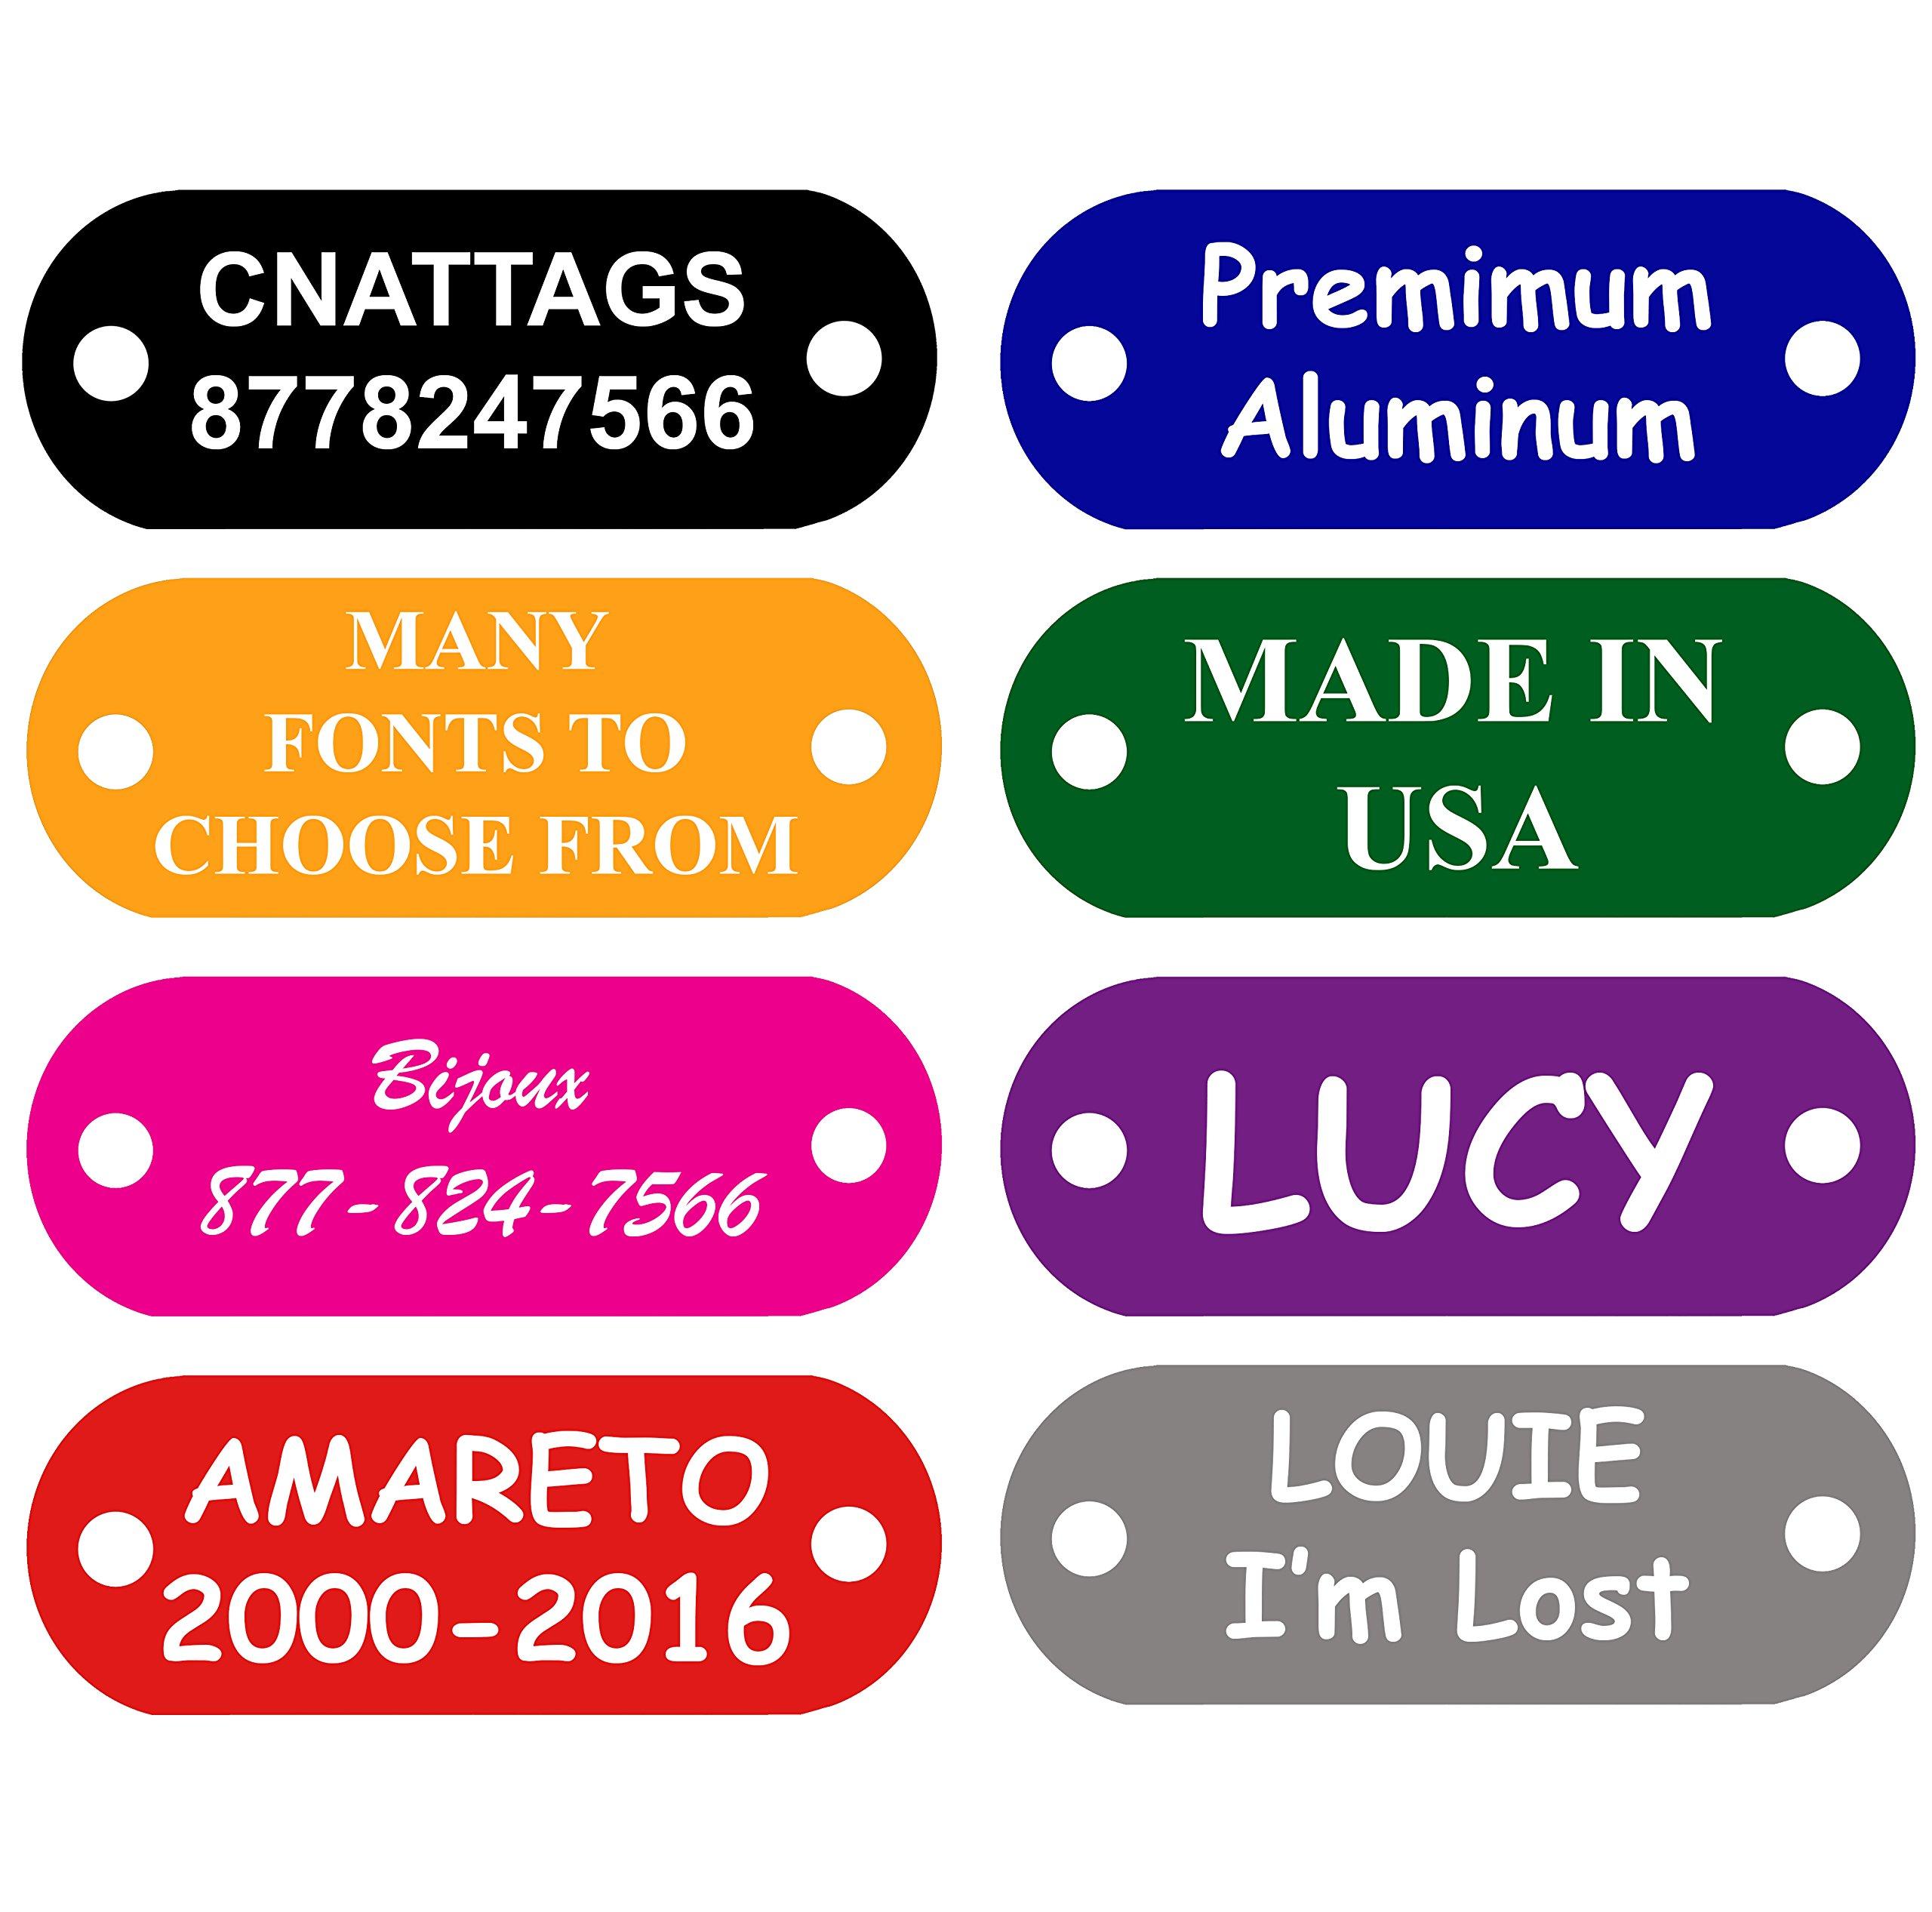 CNATTAGS Pet ID Tags Rivet Shape, 8 Colors, Personalized Premium Aluminum (RIVETS NOT INCLUDED) (Black)